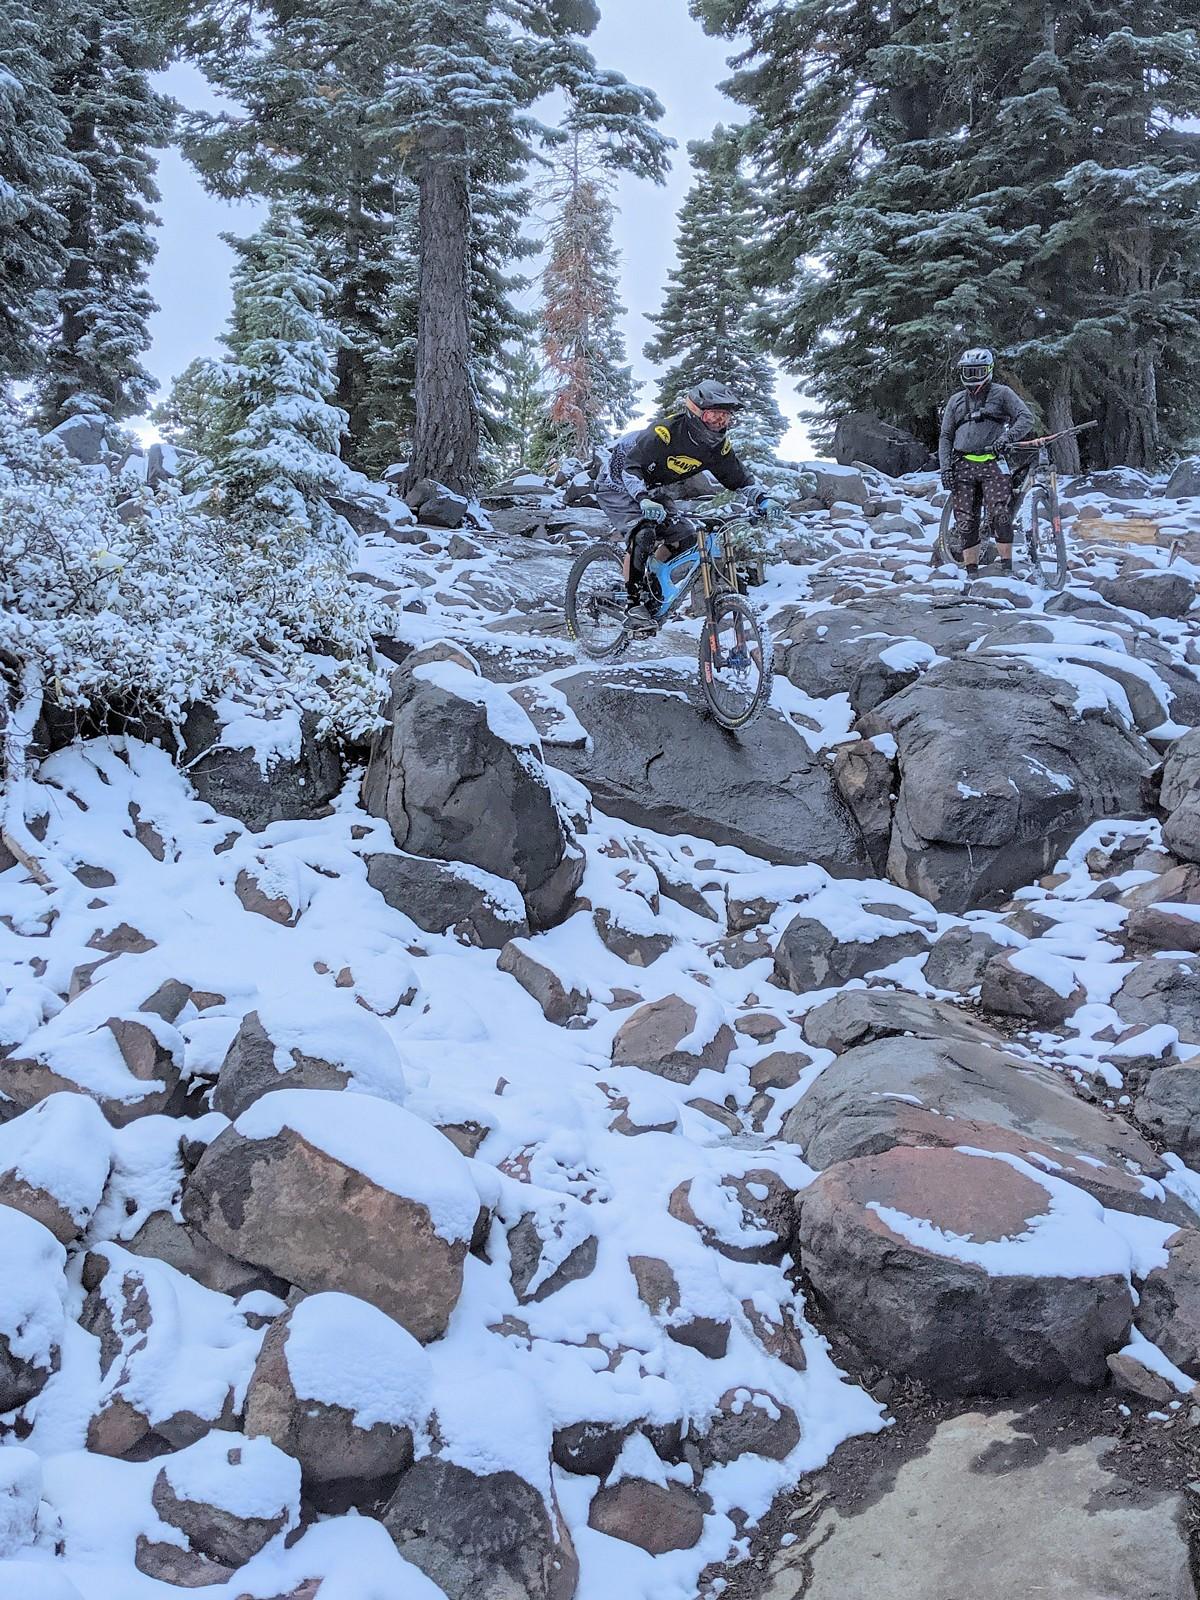 IMG 20190929 112226 - coyoterun - Mountain Biking Pictures - Vital MTB